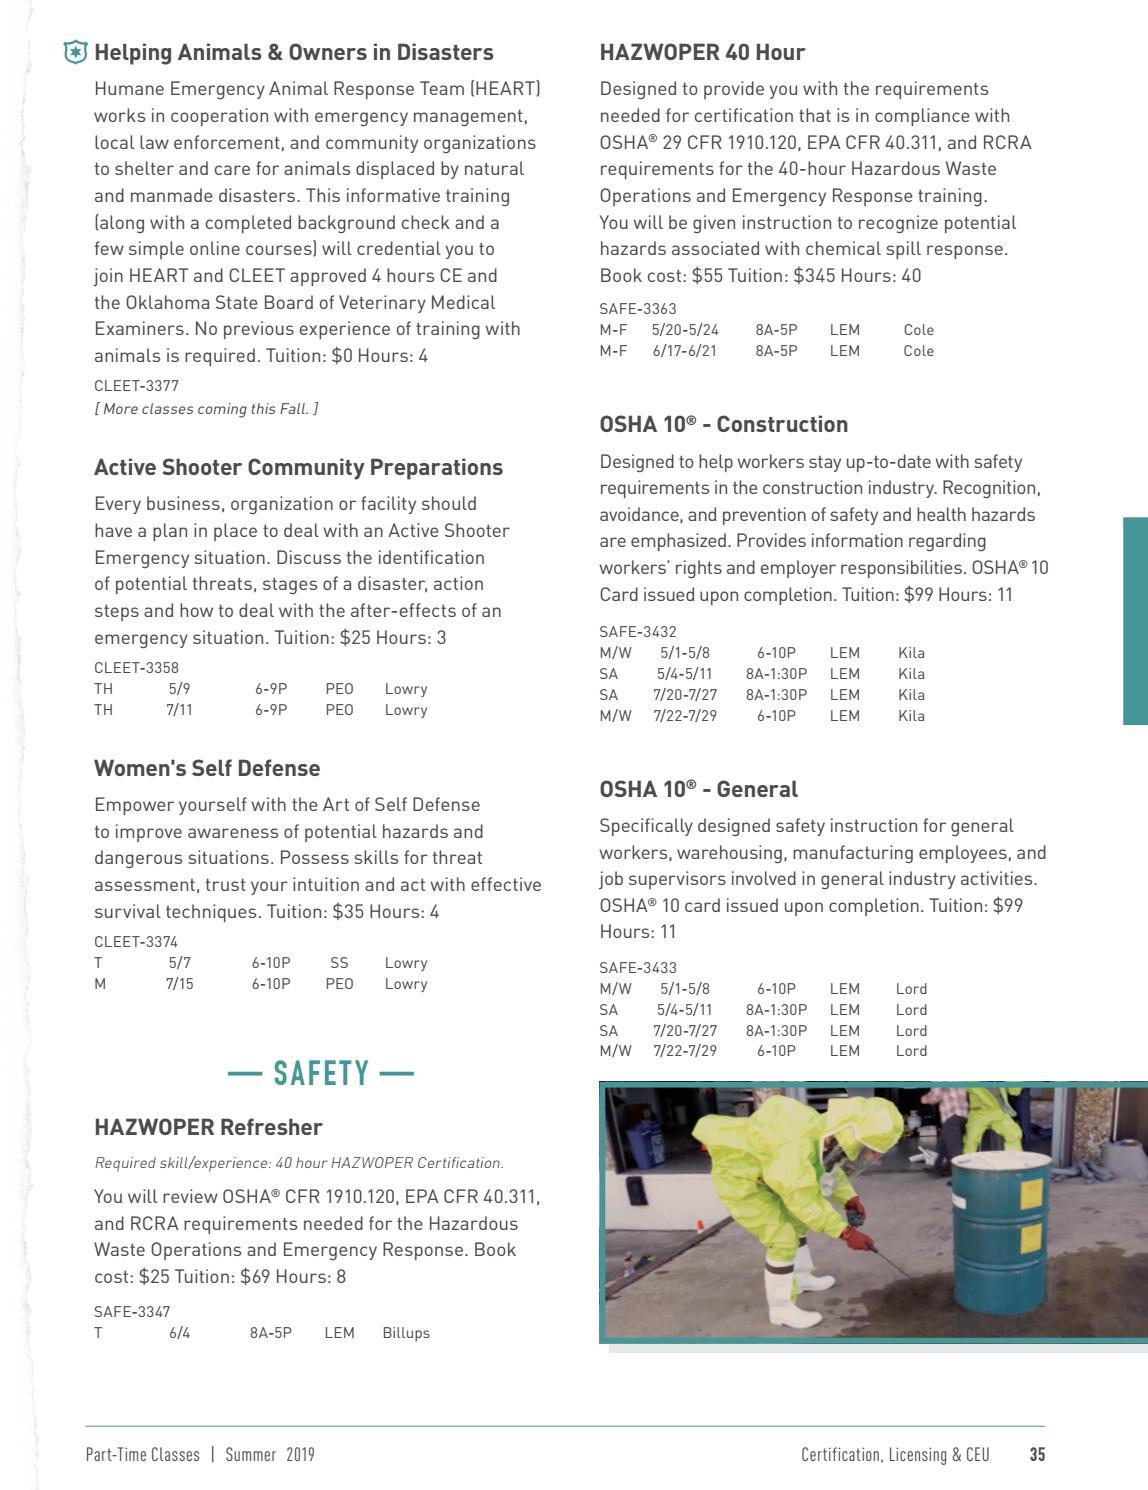 Part-Time Class Catalog - Summer 2019 by Tulsa Tech - issuu